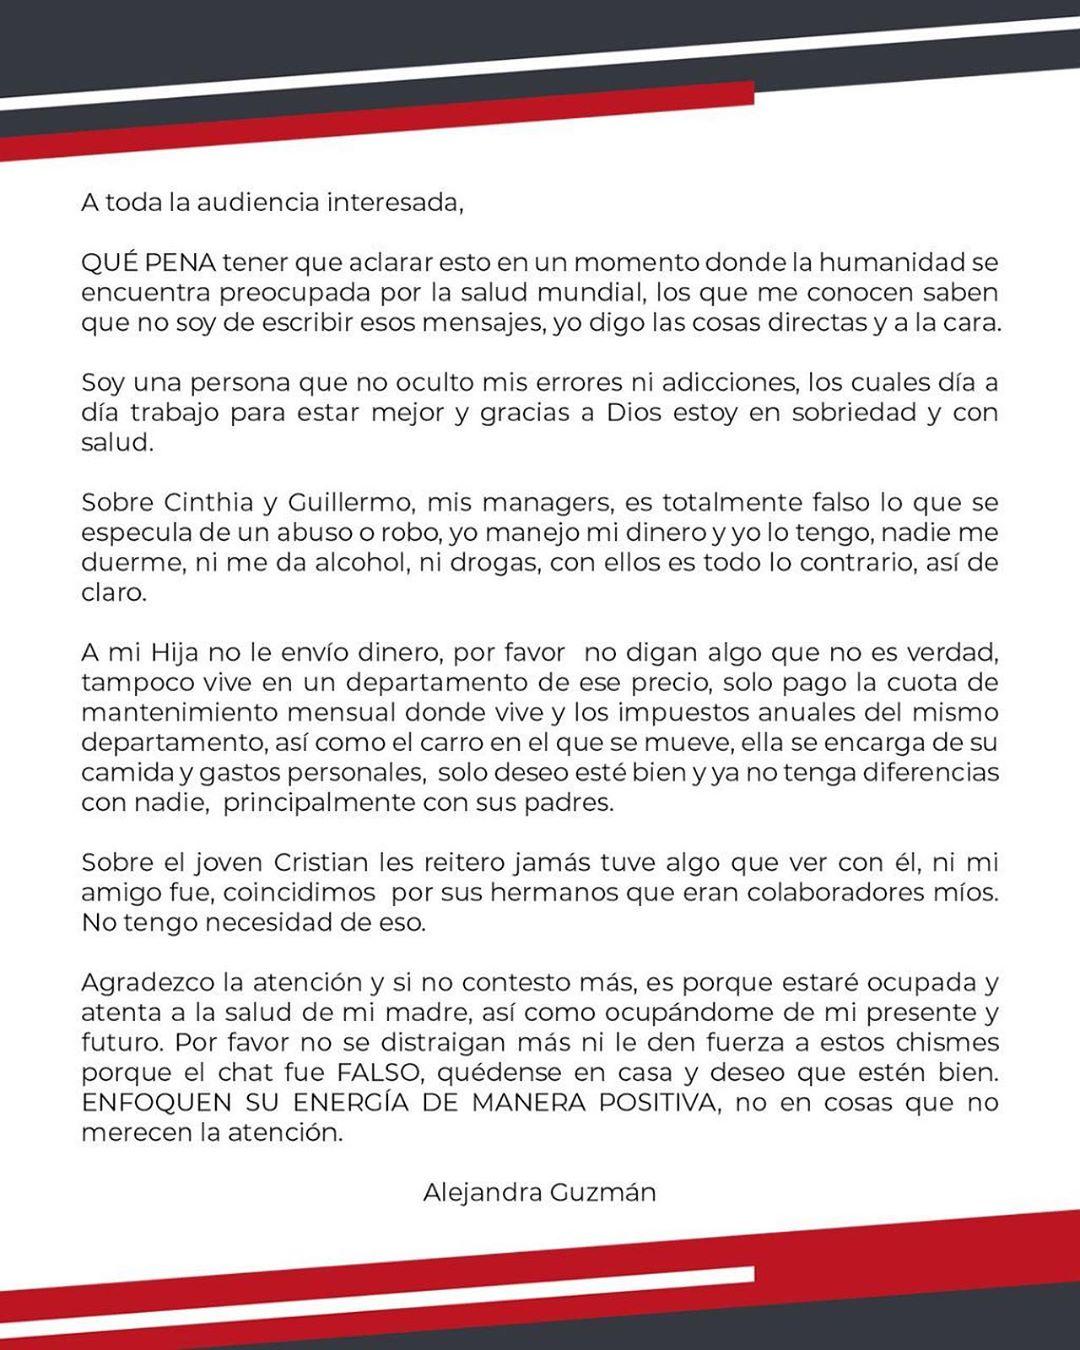 Alejandra Guzman desmiente mantener a Frida Sofia